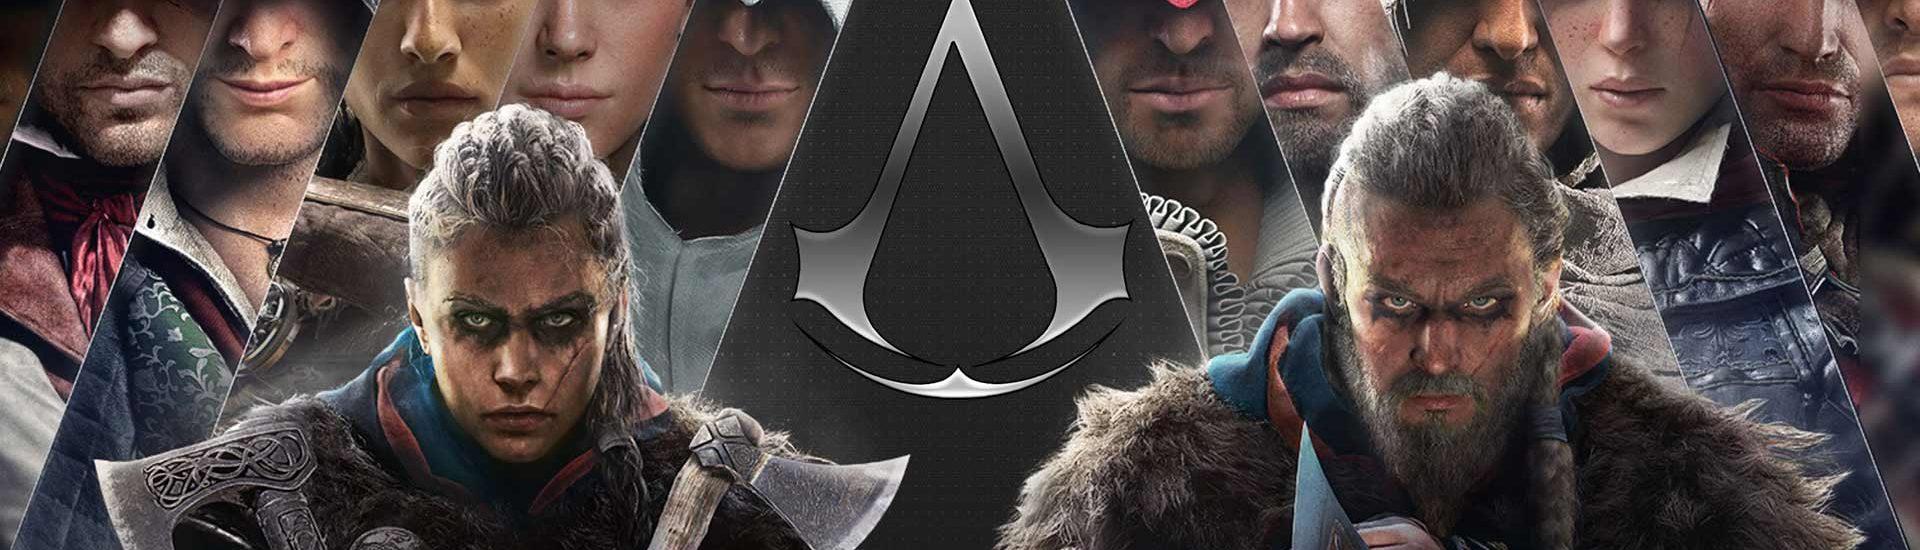 Jason Schreier: Assassin's Creed Infinity wird offenbar Online-Spiel